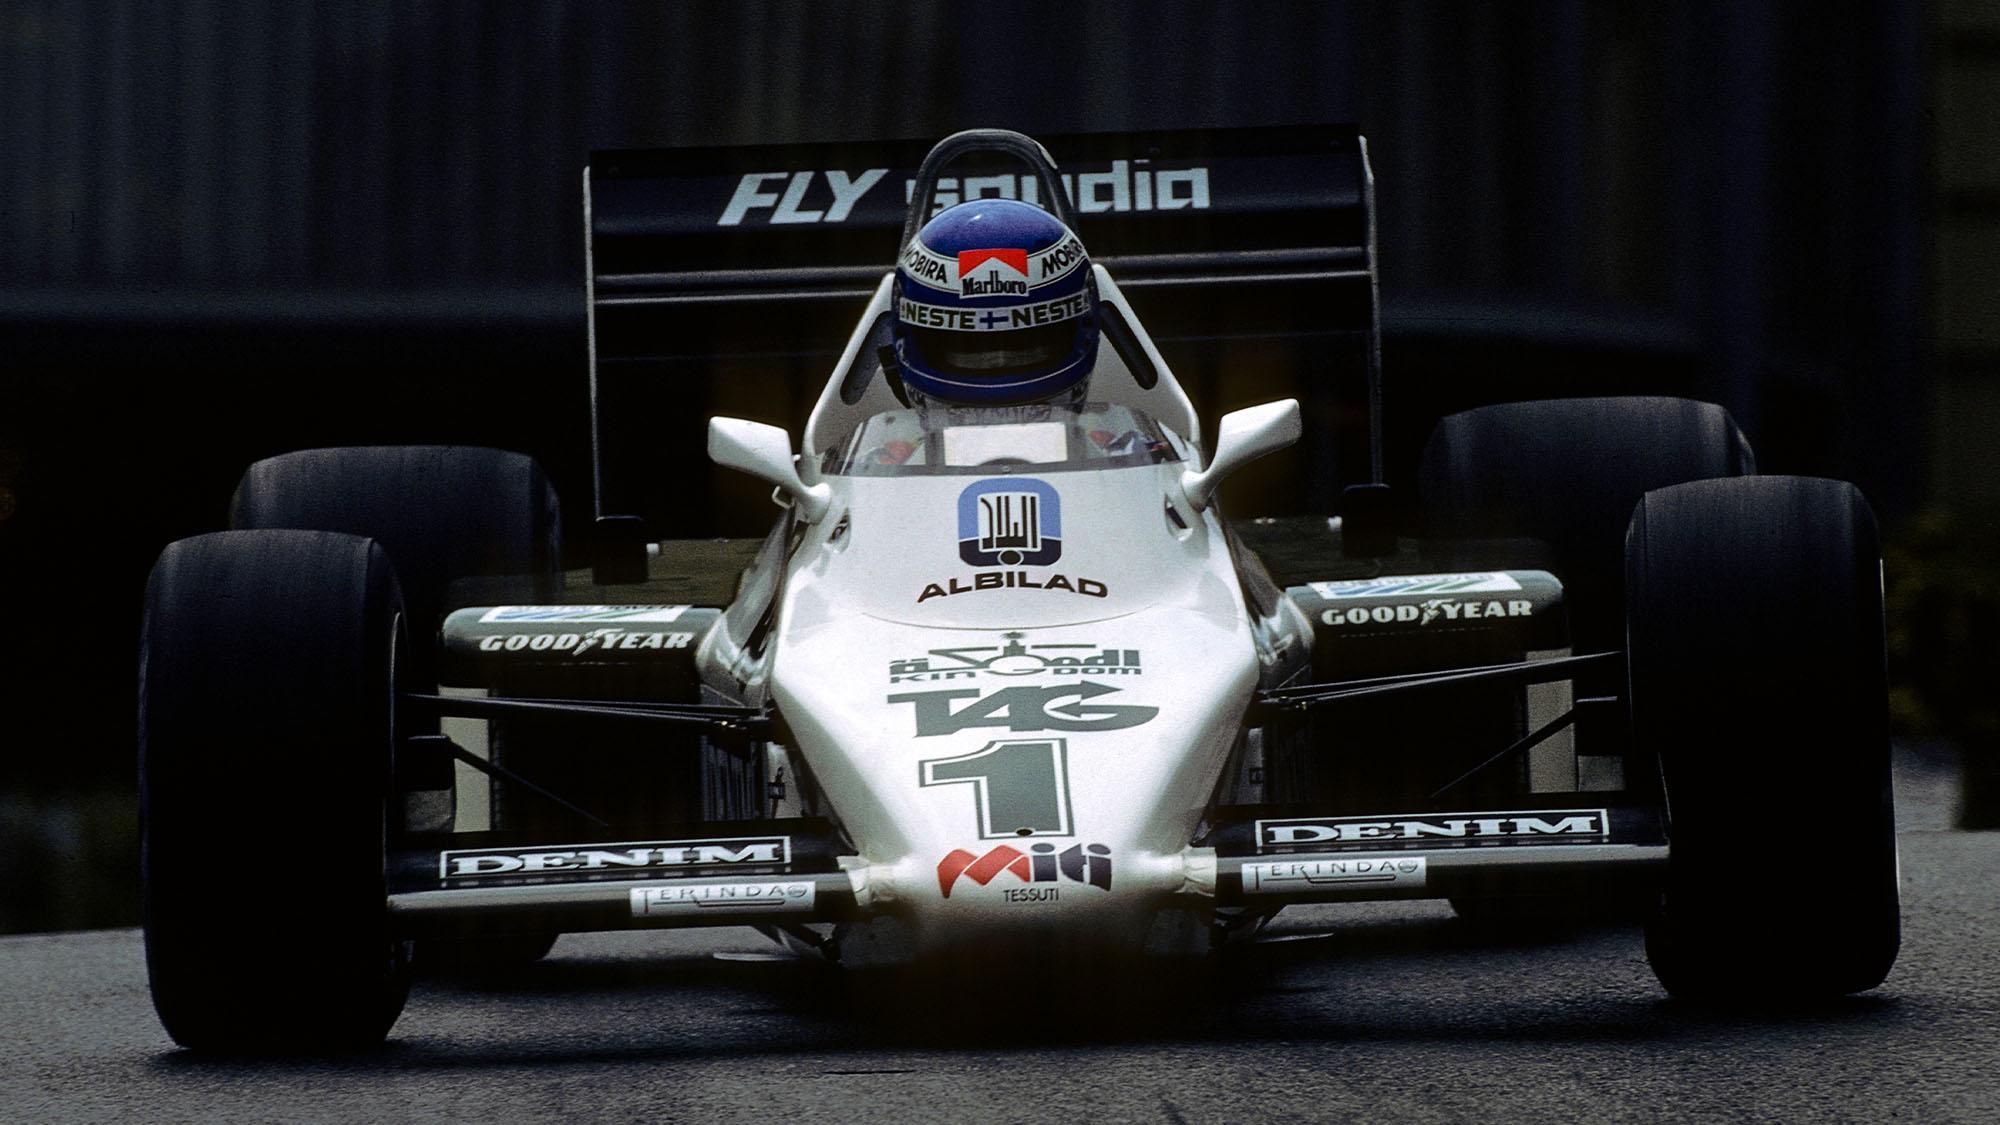 Keke Rosberg, Williams-Ford FW08C, Grand Prix of Monaco, Circuit de Monaco, 15 May 1983. Keke Rosberg and his Williams-Ford FW08C on the way to victory in the 1983 Grand Prix of Monaco. (Photo by Paul-Henri Cahier/Getty Images)